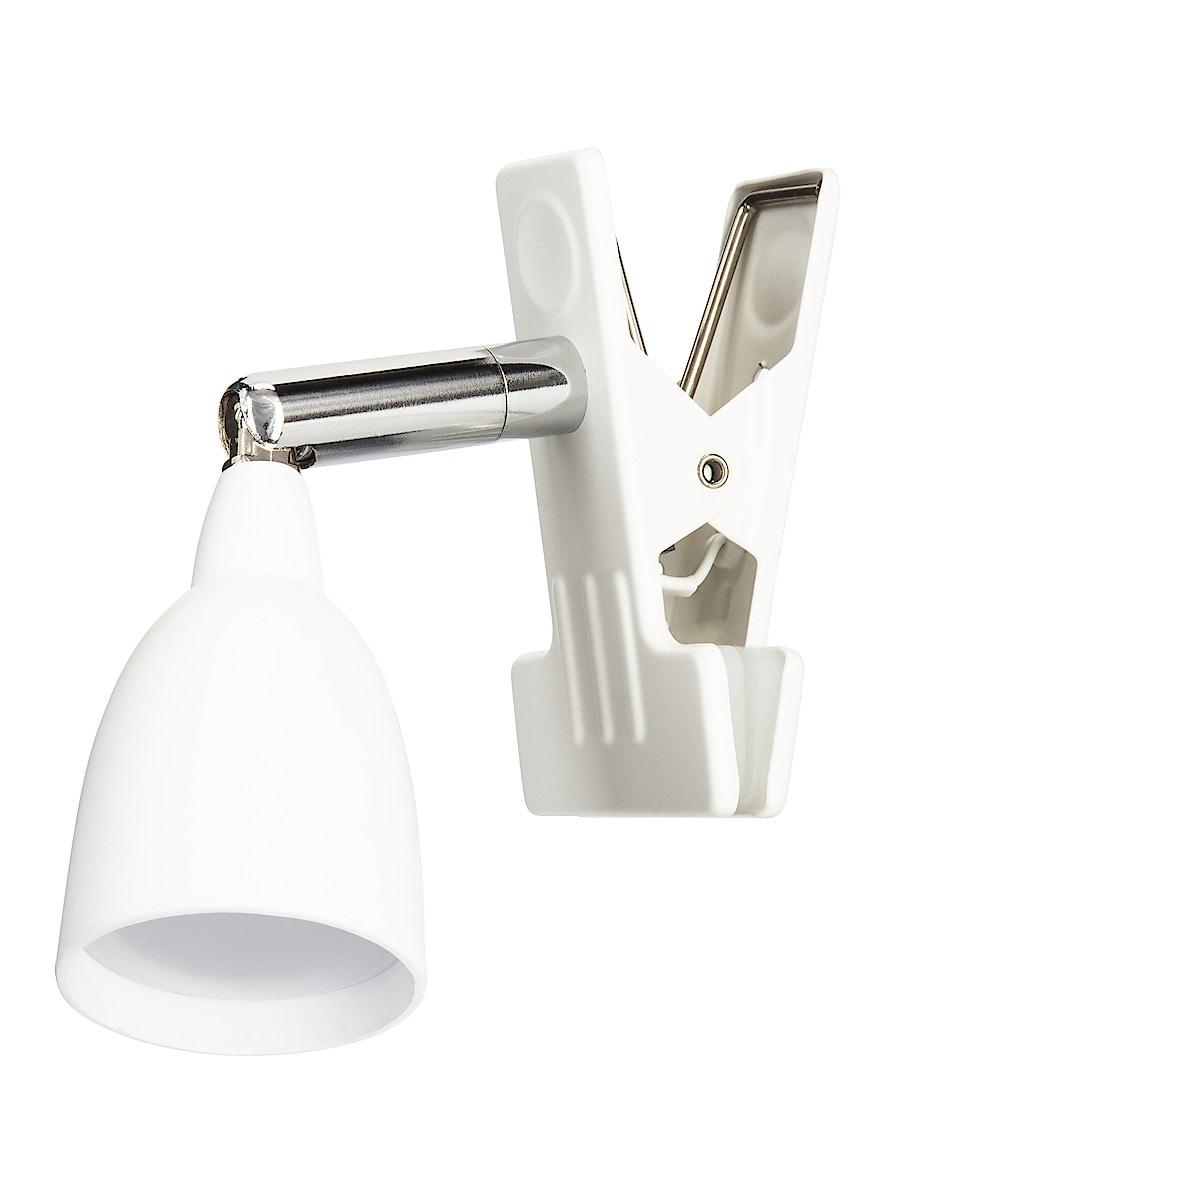 Northlight Clip-On Lamp